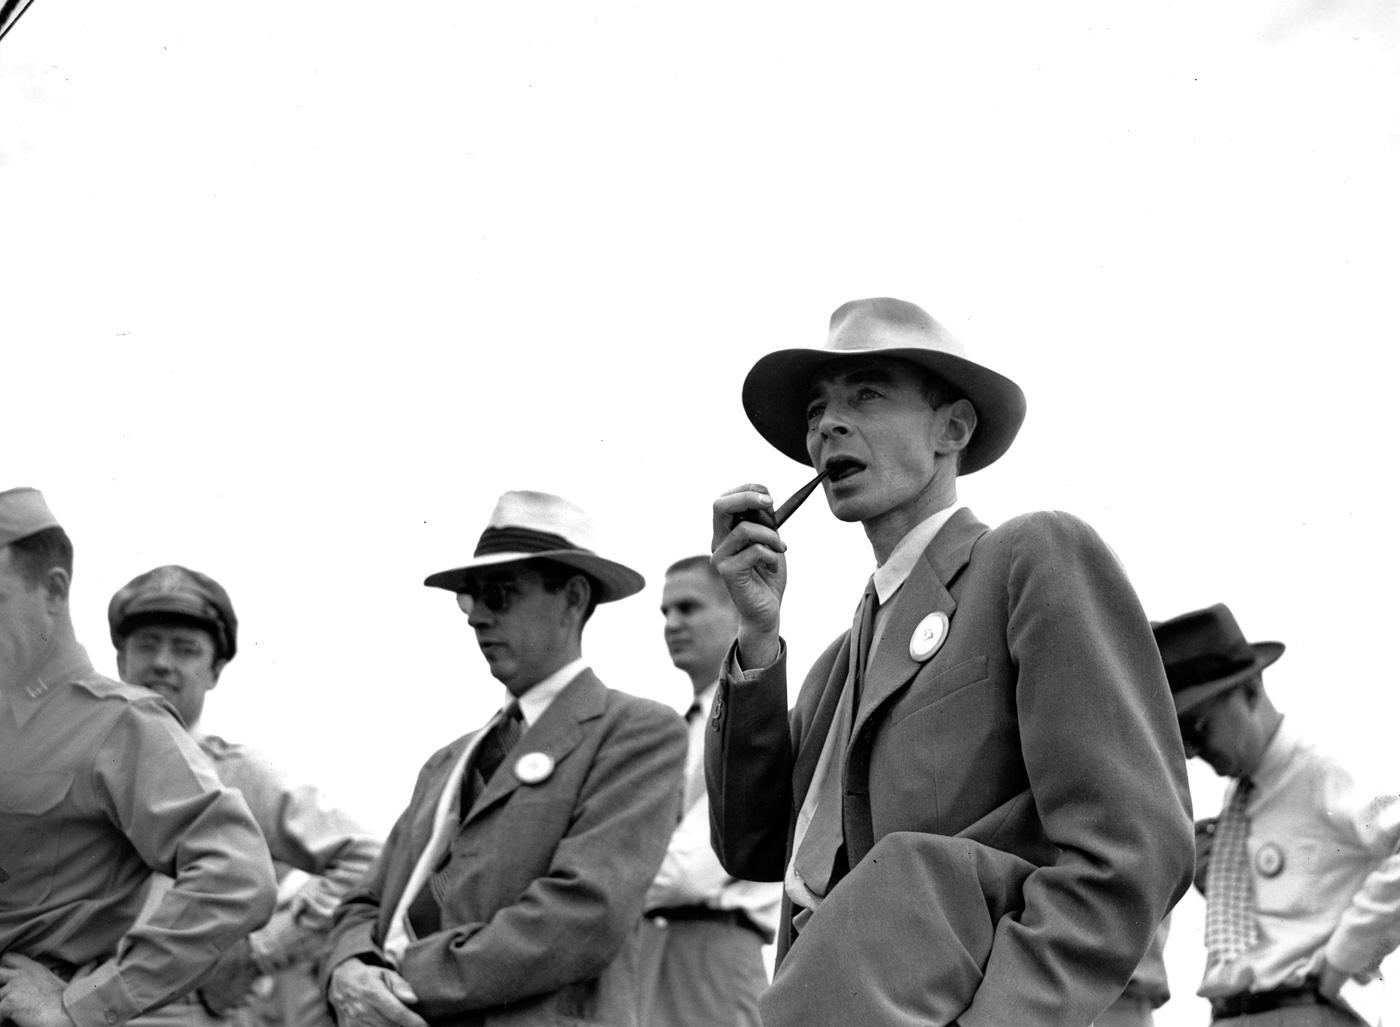 Роберт Оппенгеймер на полигоне Аламогордо, США, 1945 год